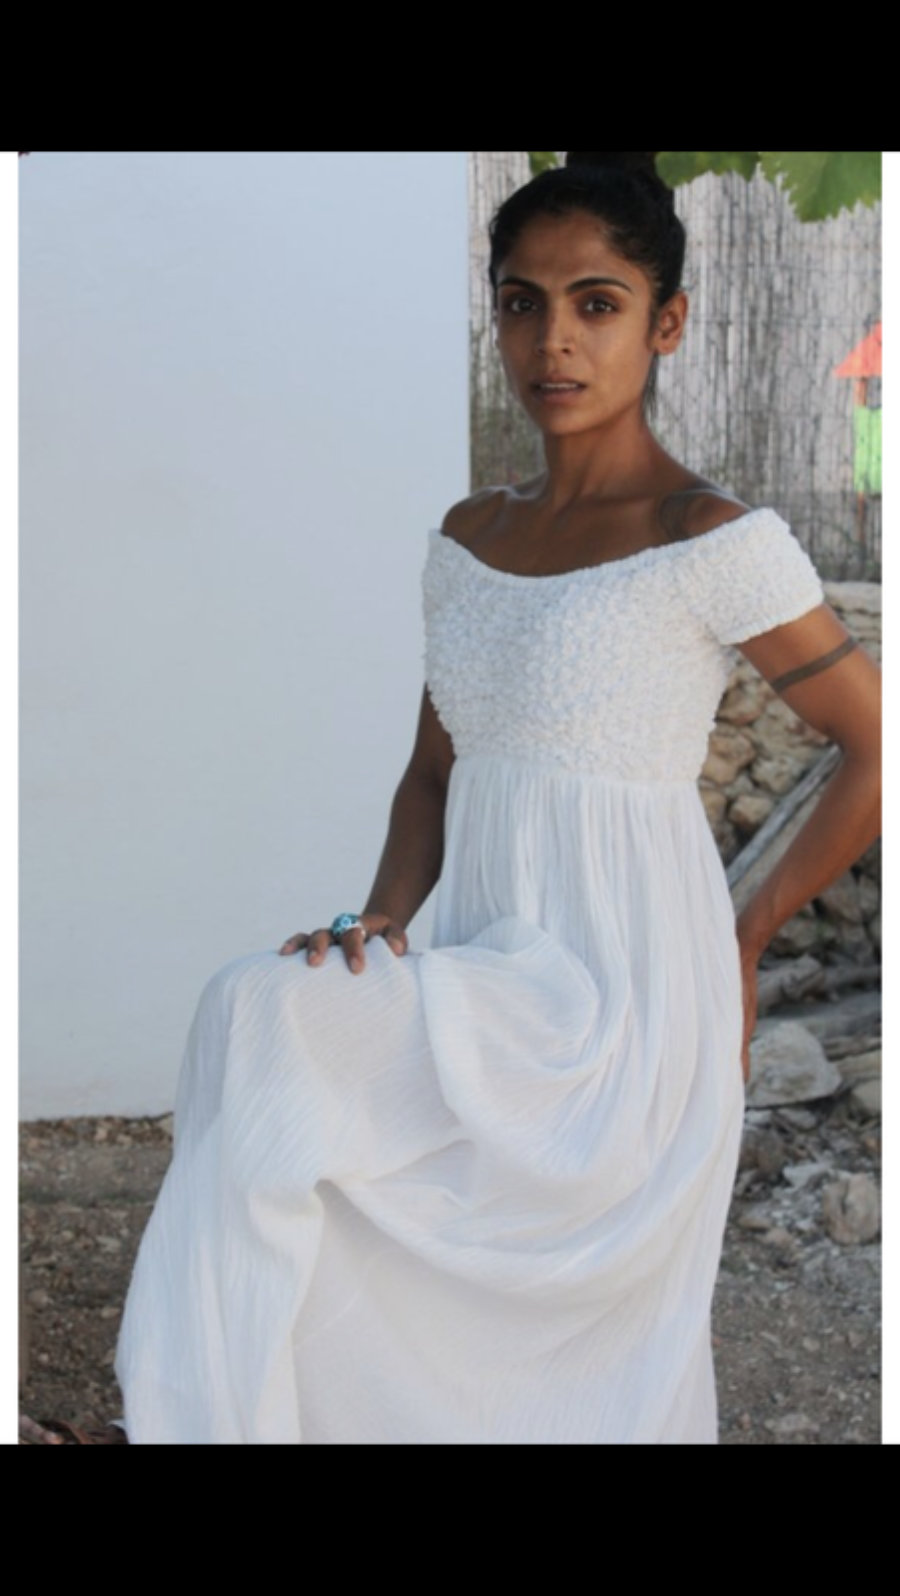 Vestido Globo, moda Adlib hecho a mano en Ibiza